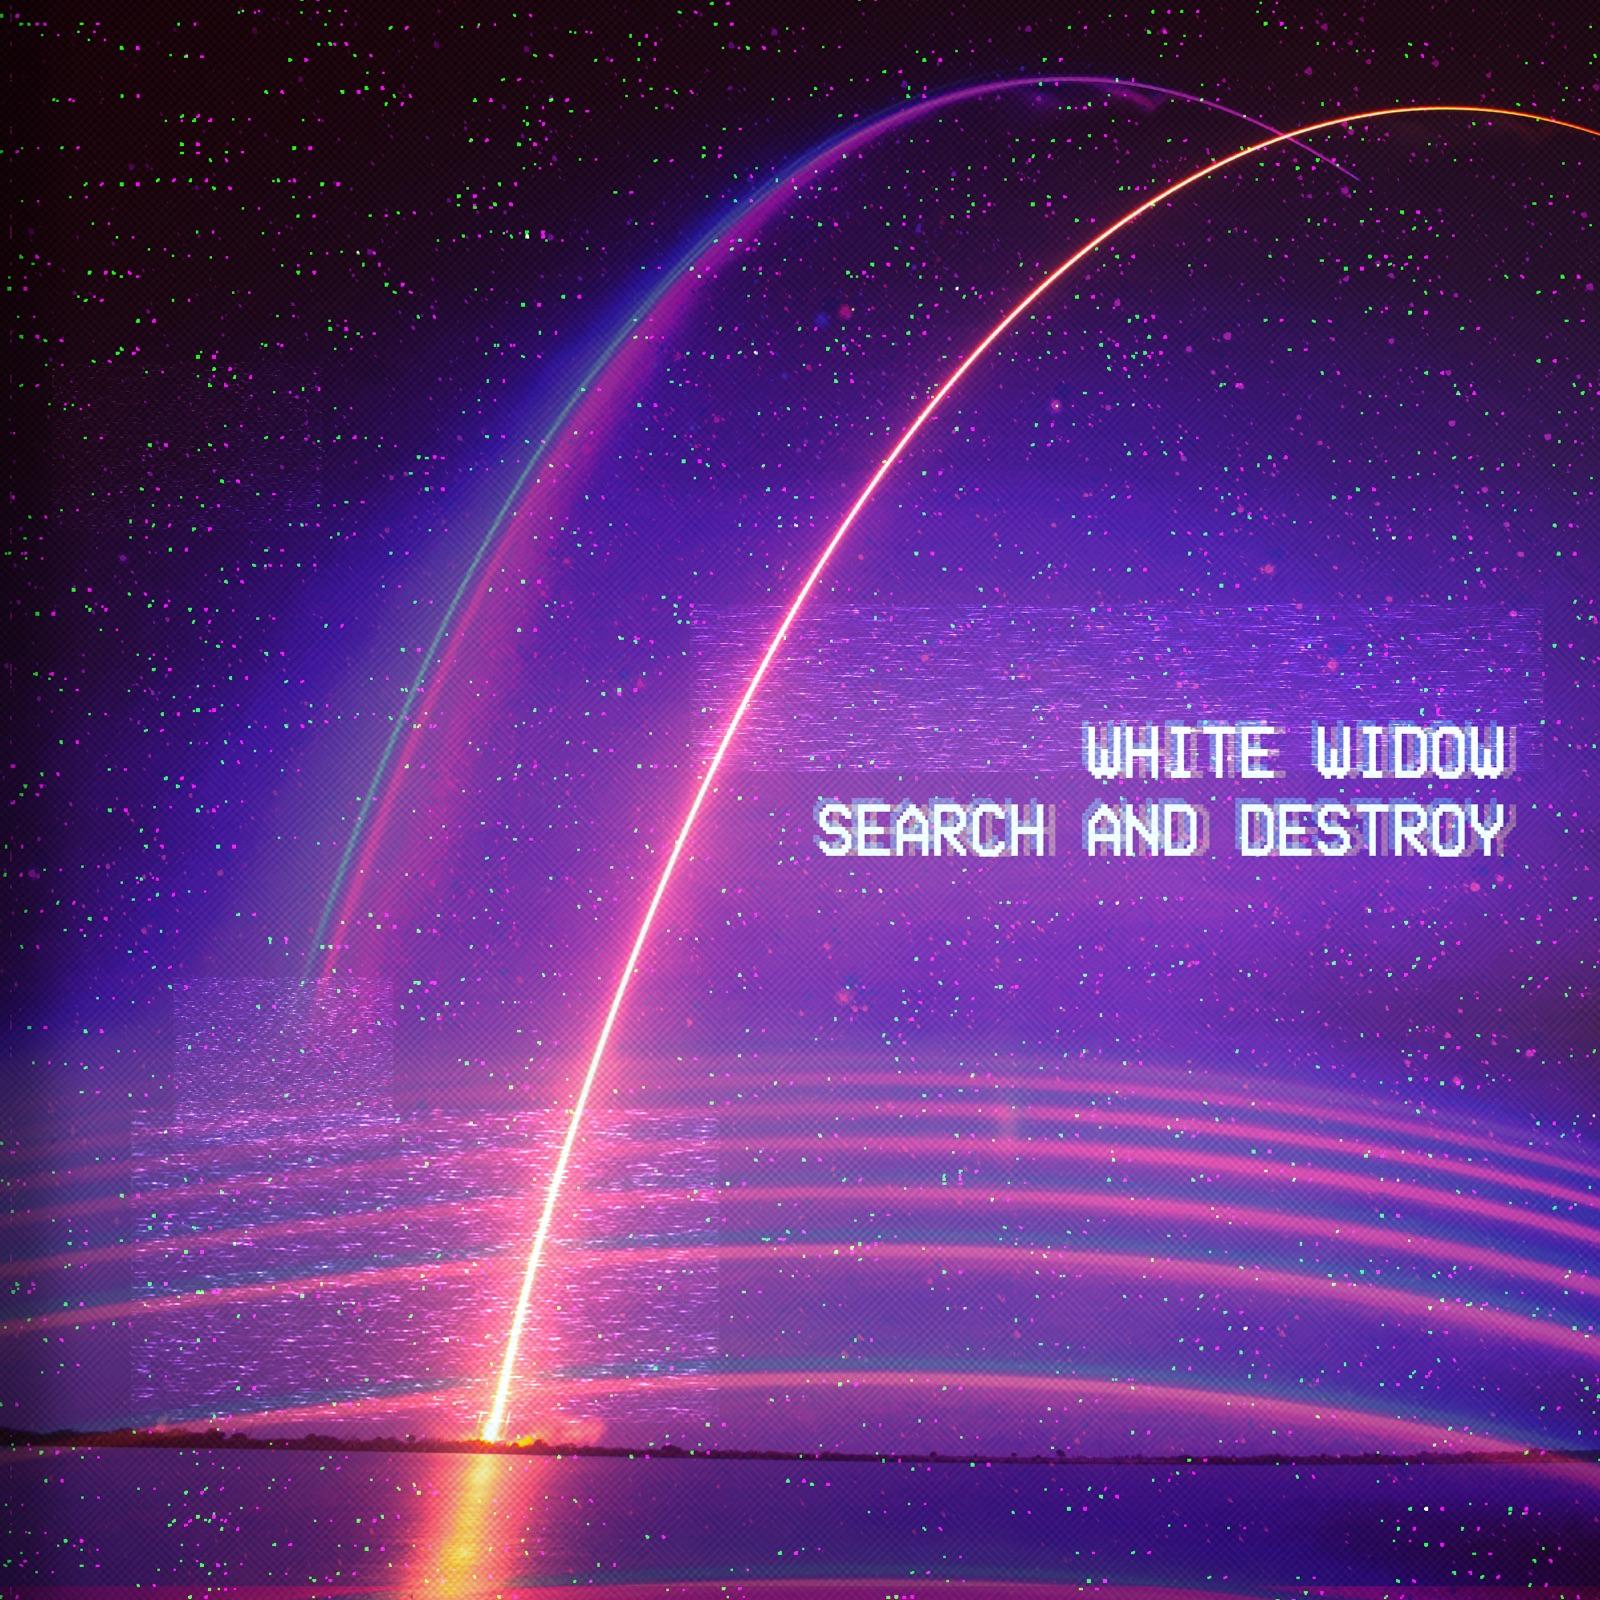 Search + Destroy